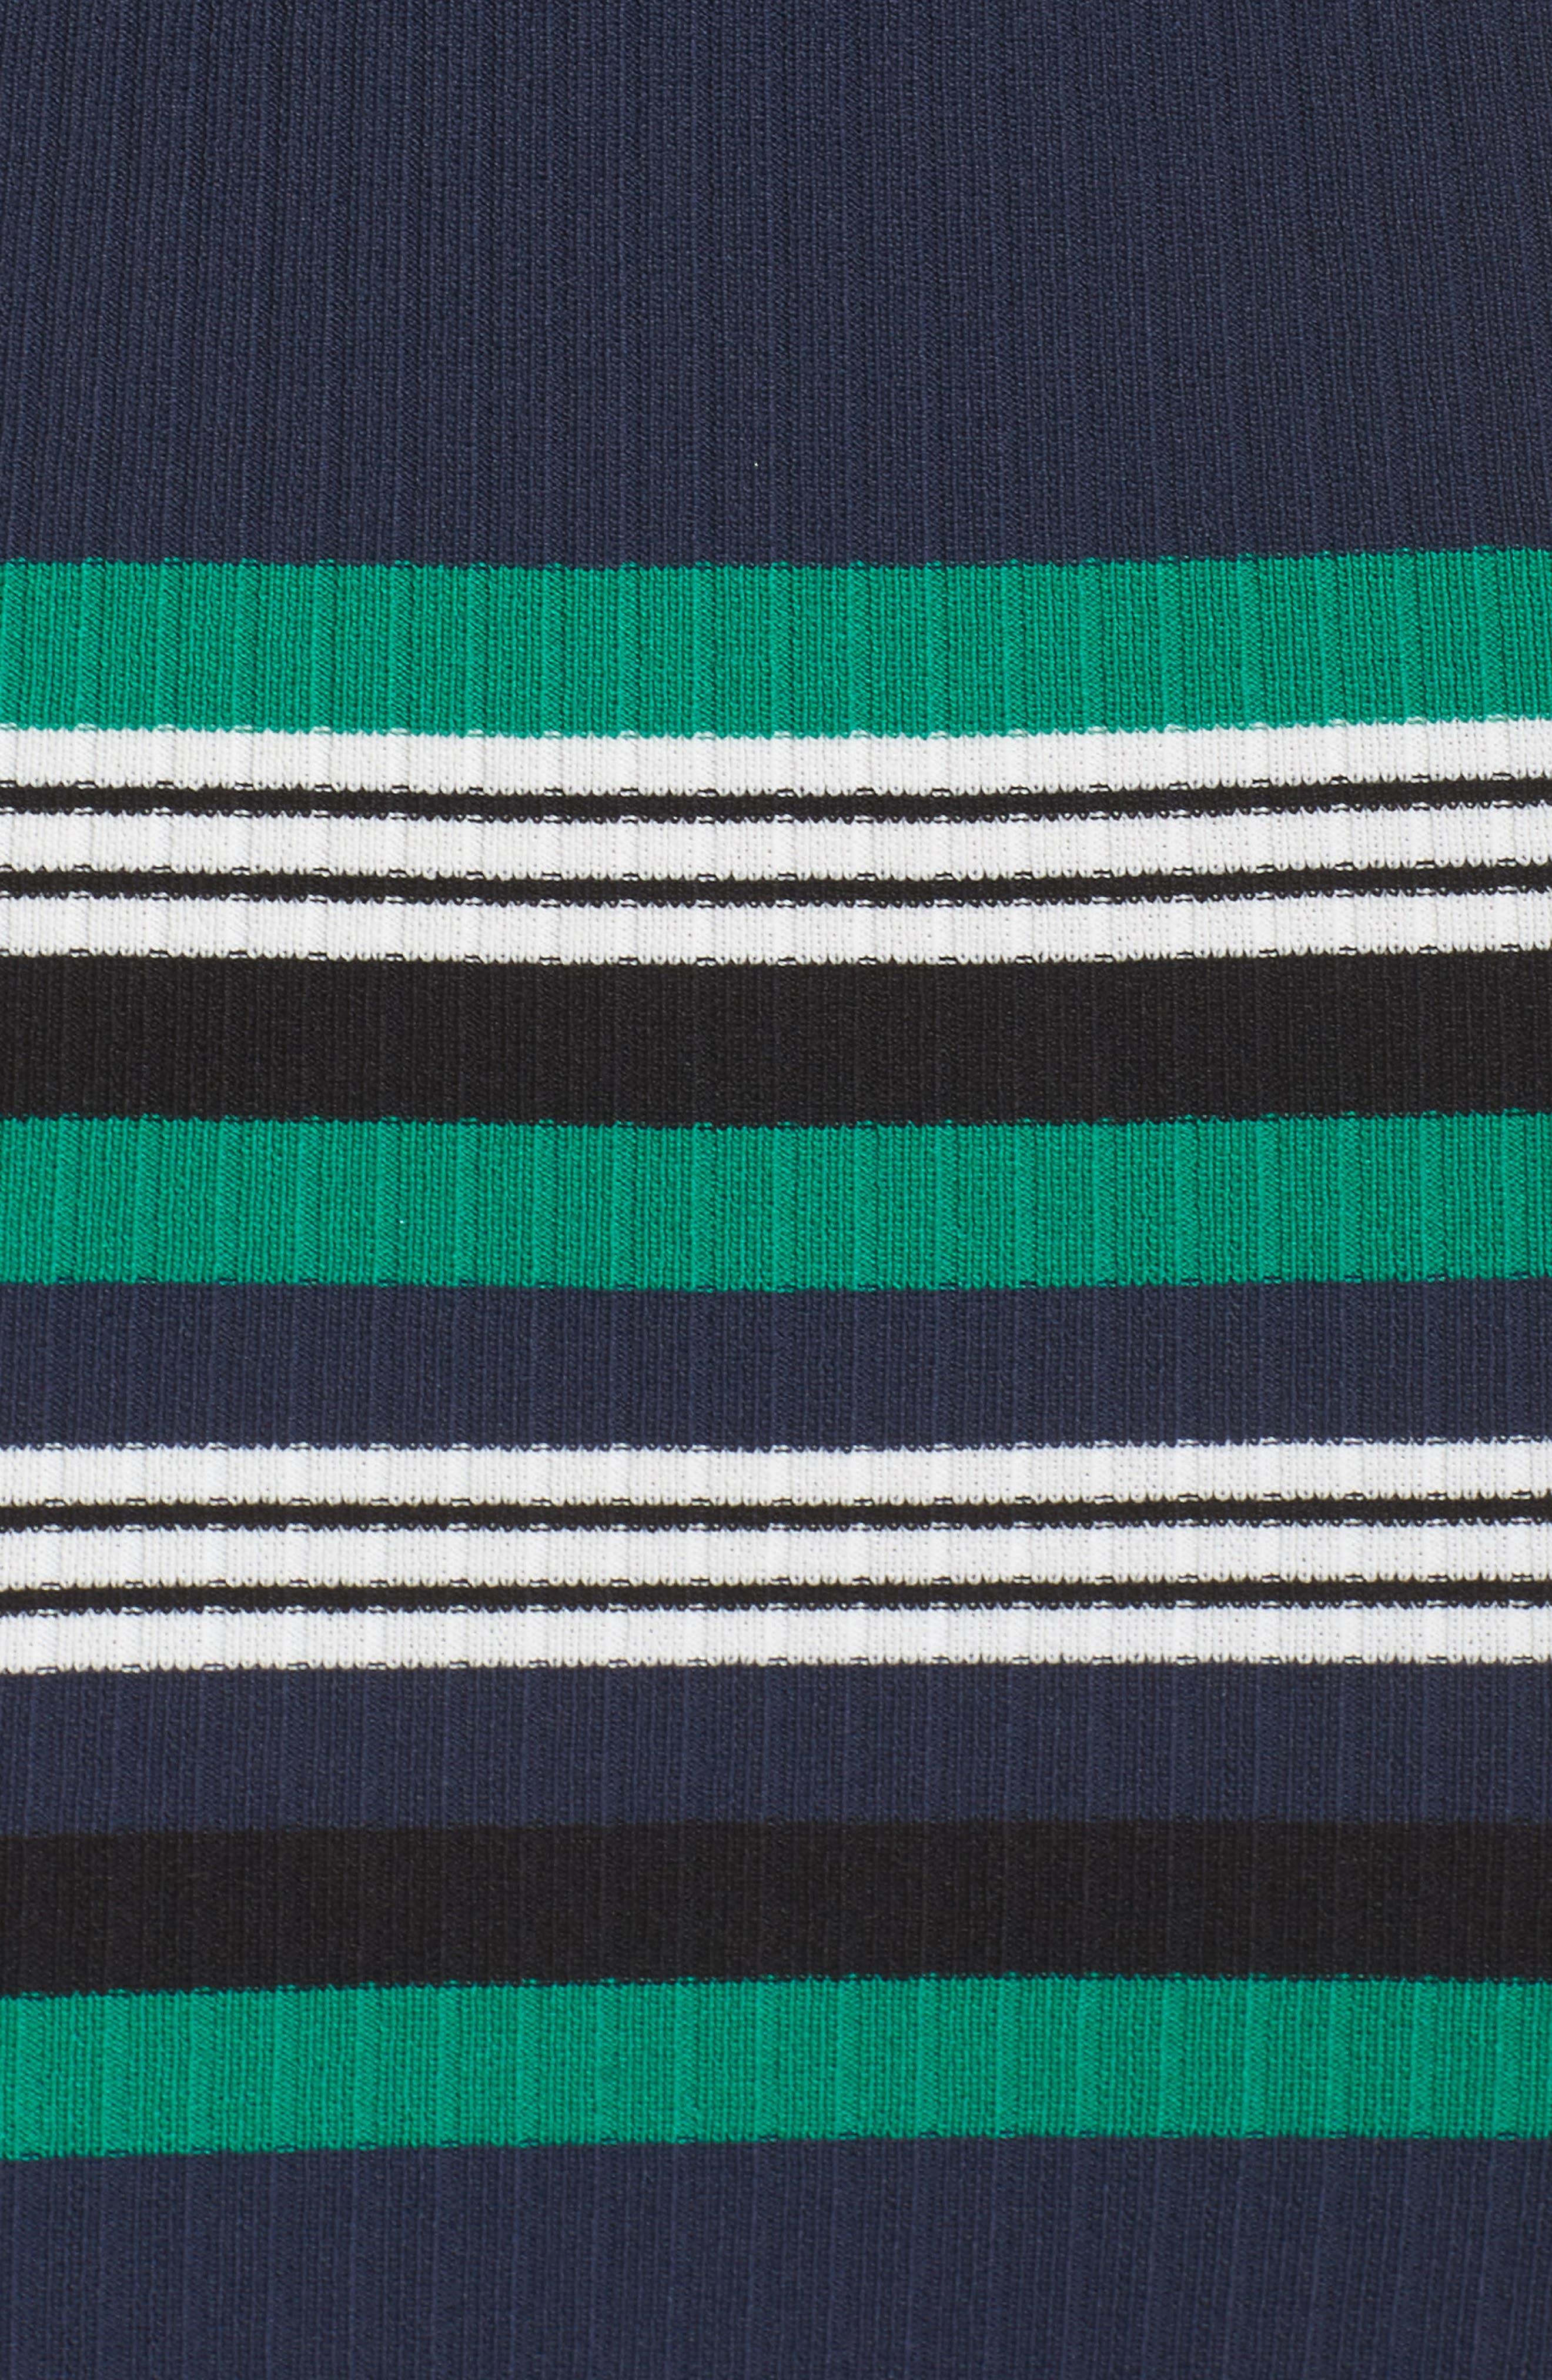 Callie Stripe Body-Con Dress,                             Alternate thumbnail 5, color,                             Navy